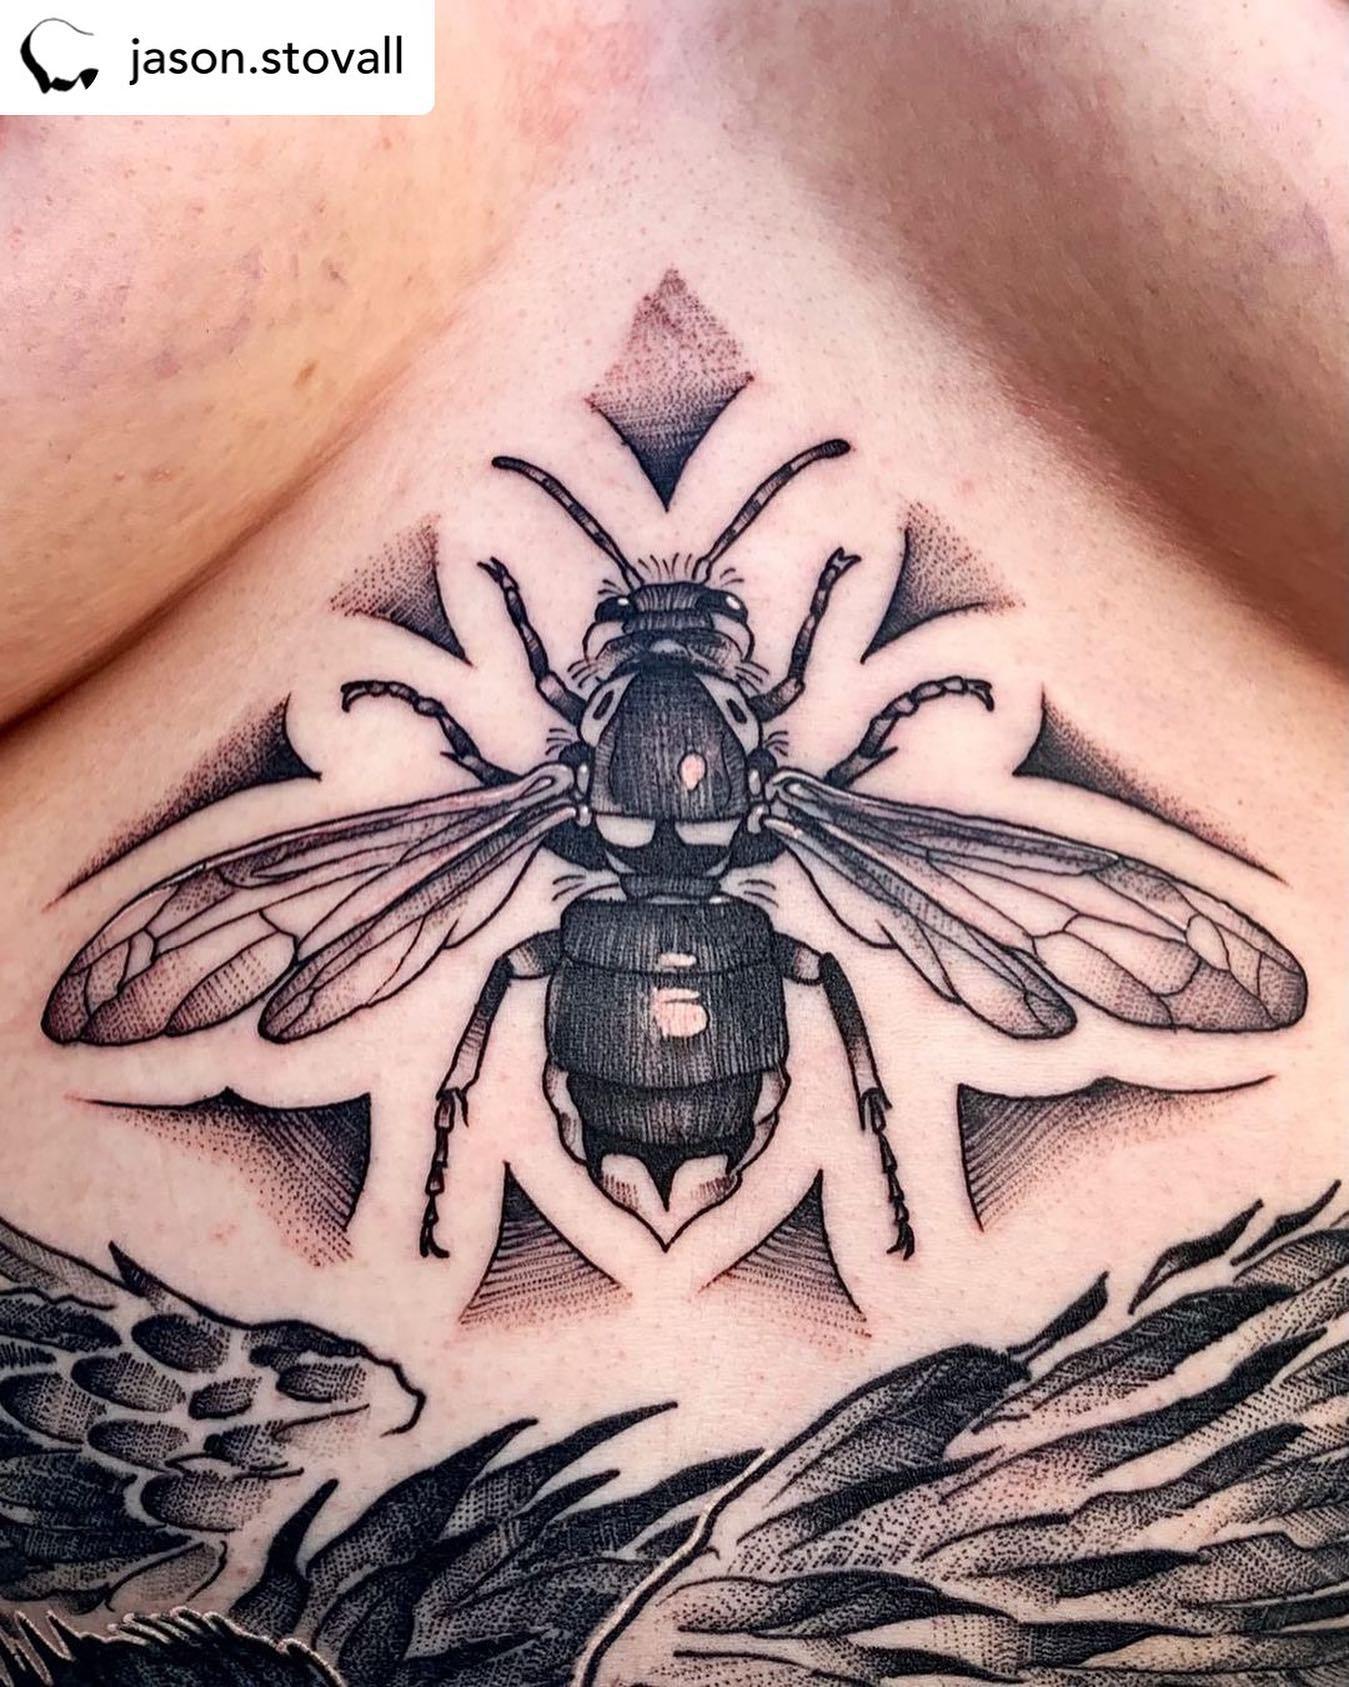 • @jason.stovall Bald-faced Hornet sternum tat. Ouch. Thanks M!!! ......# #baldfacedhornet #hornettattoo #sternumtat #stomachtattoo #wasptattoo #tattoozoo #jasonstovall